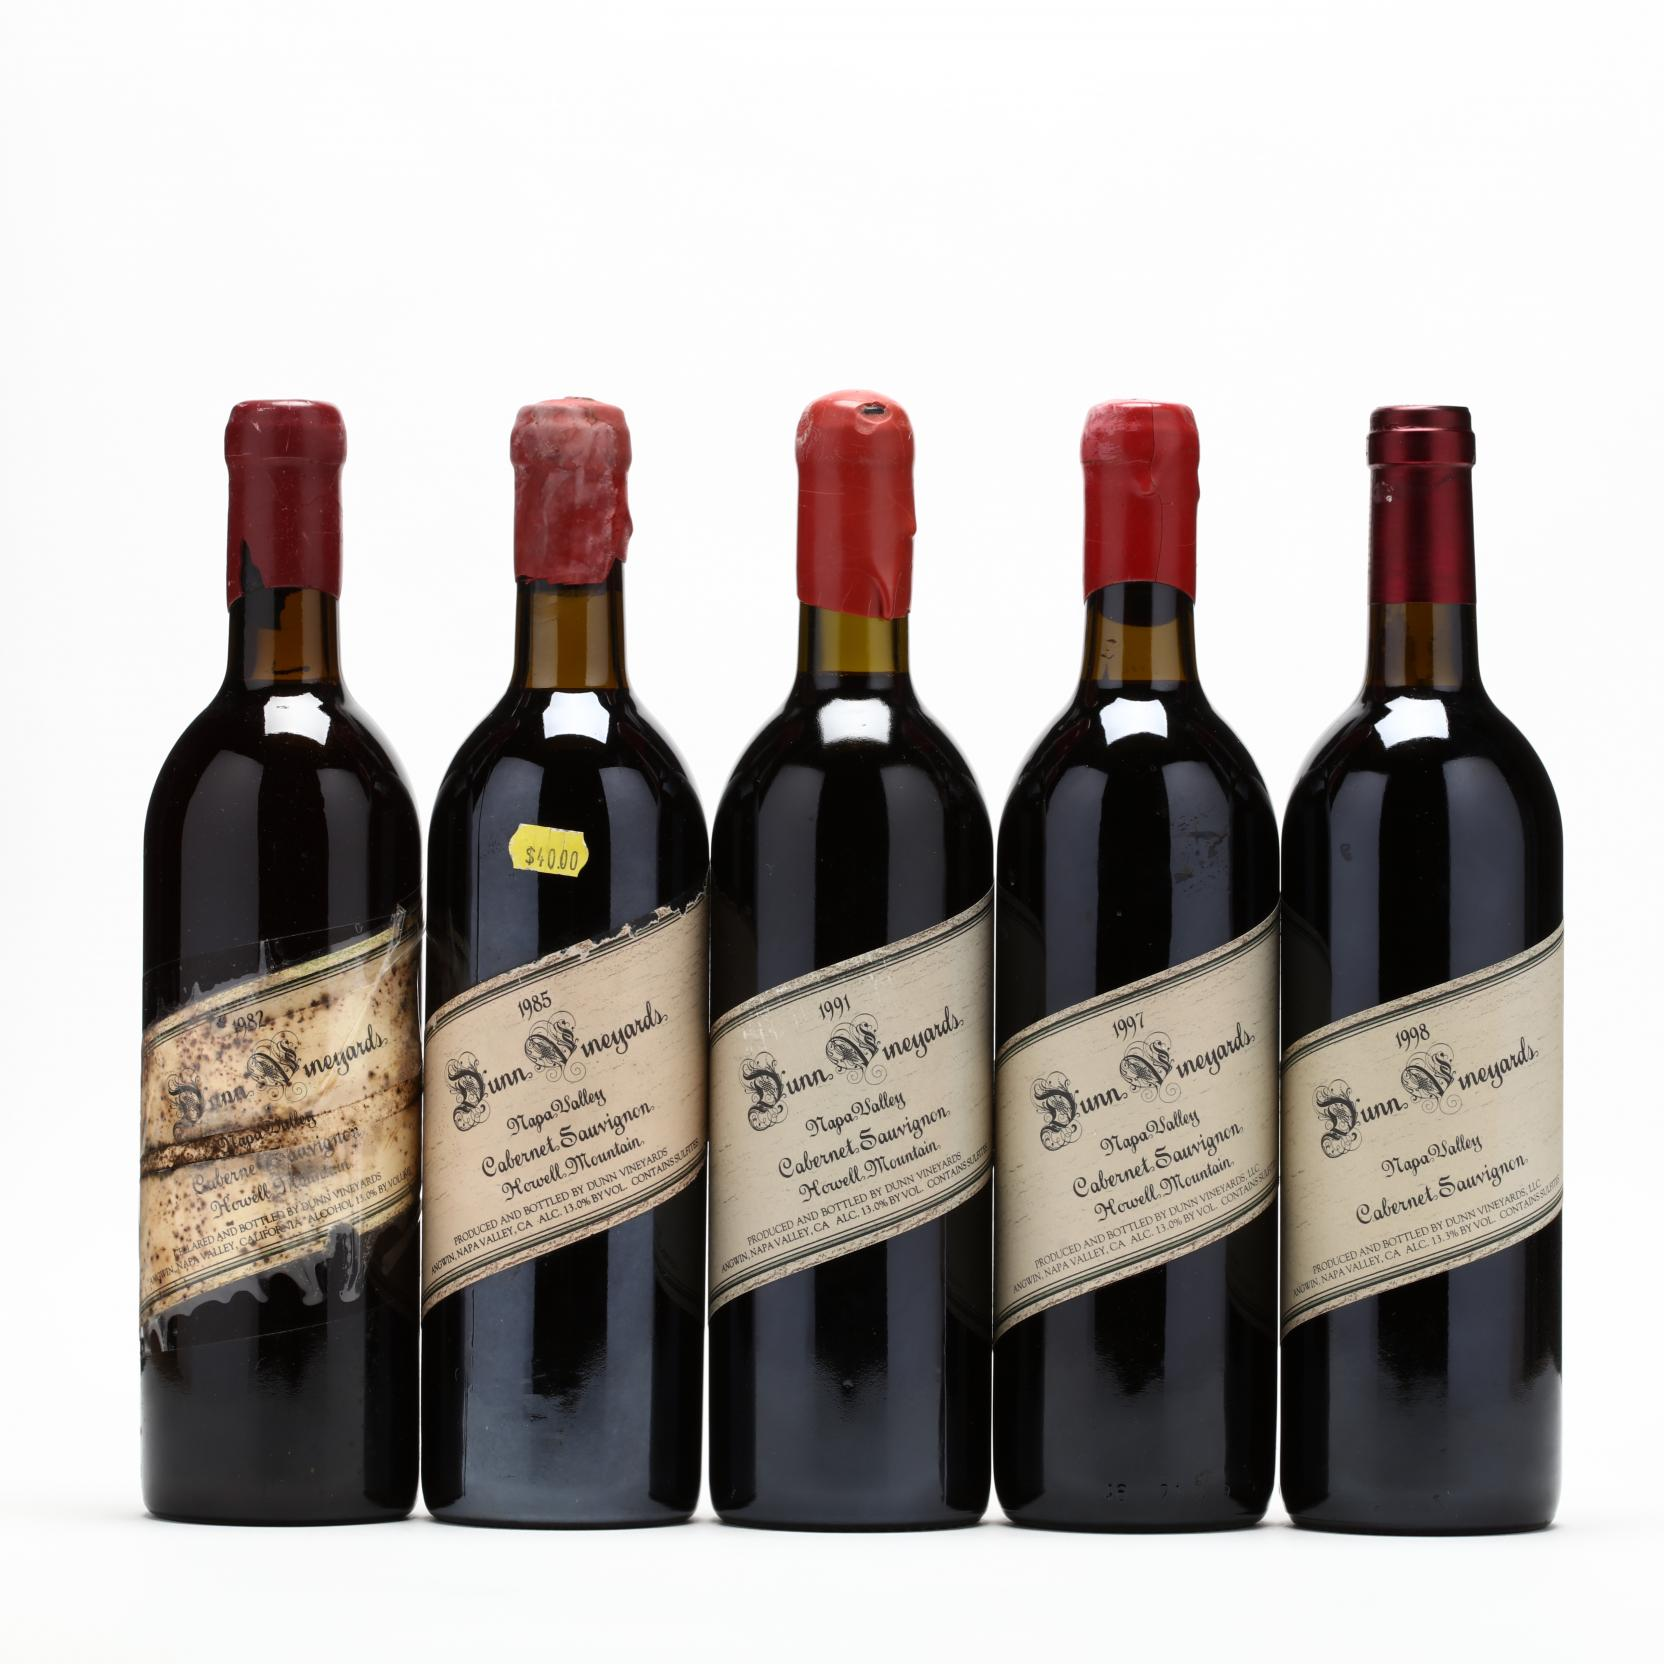 1982-1985-1991-1997-1998-dunn-vineyards